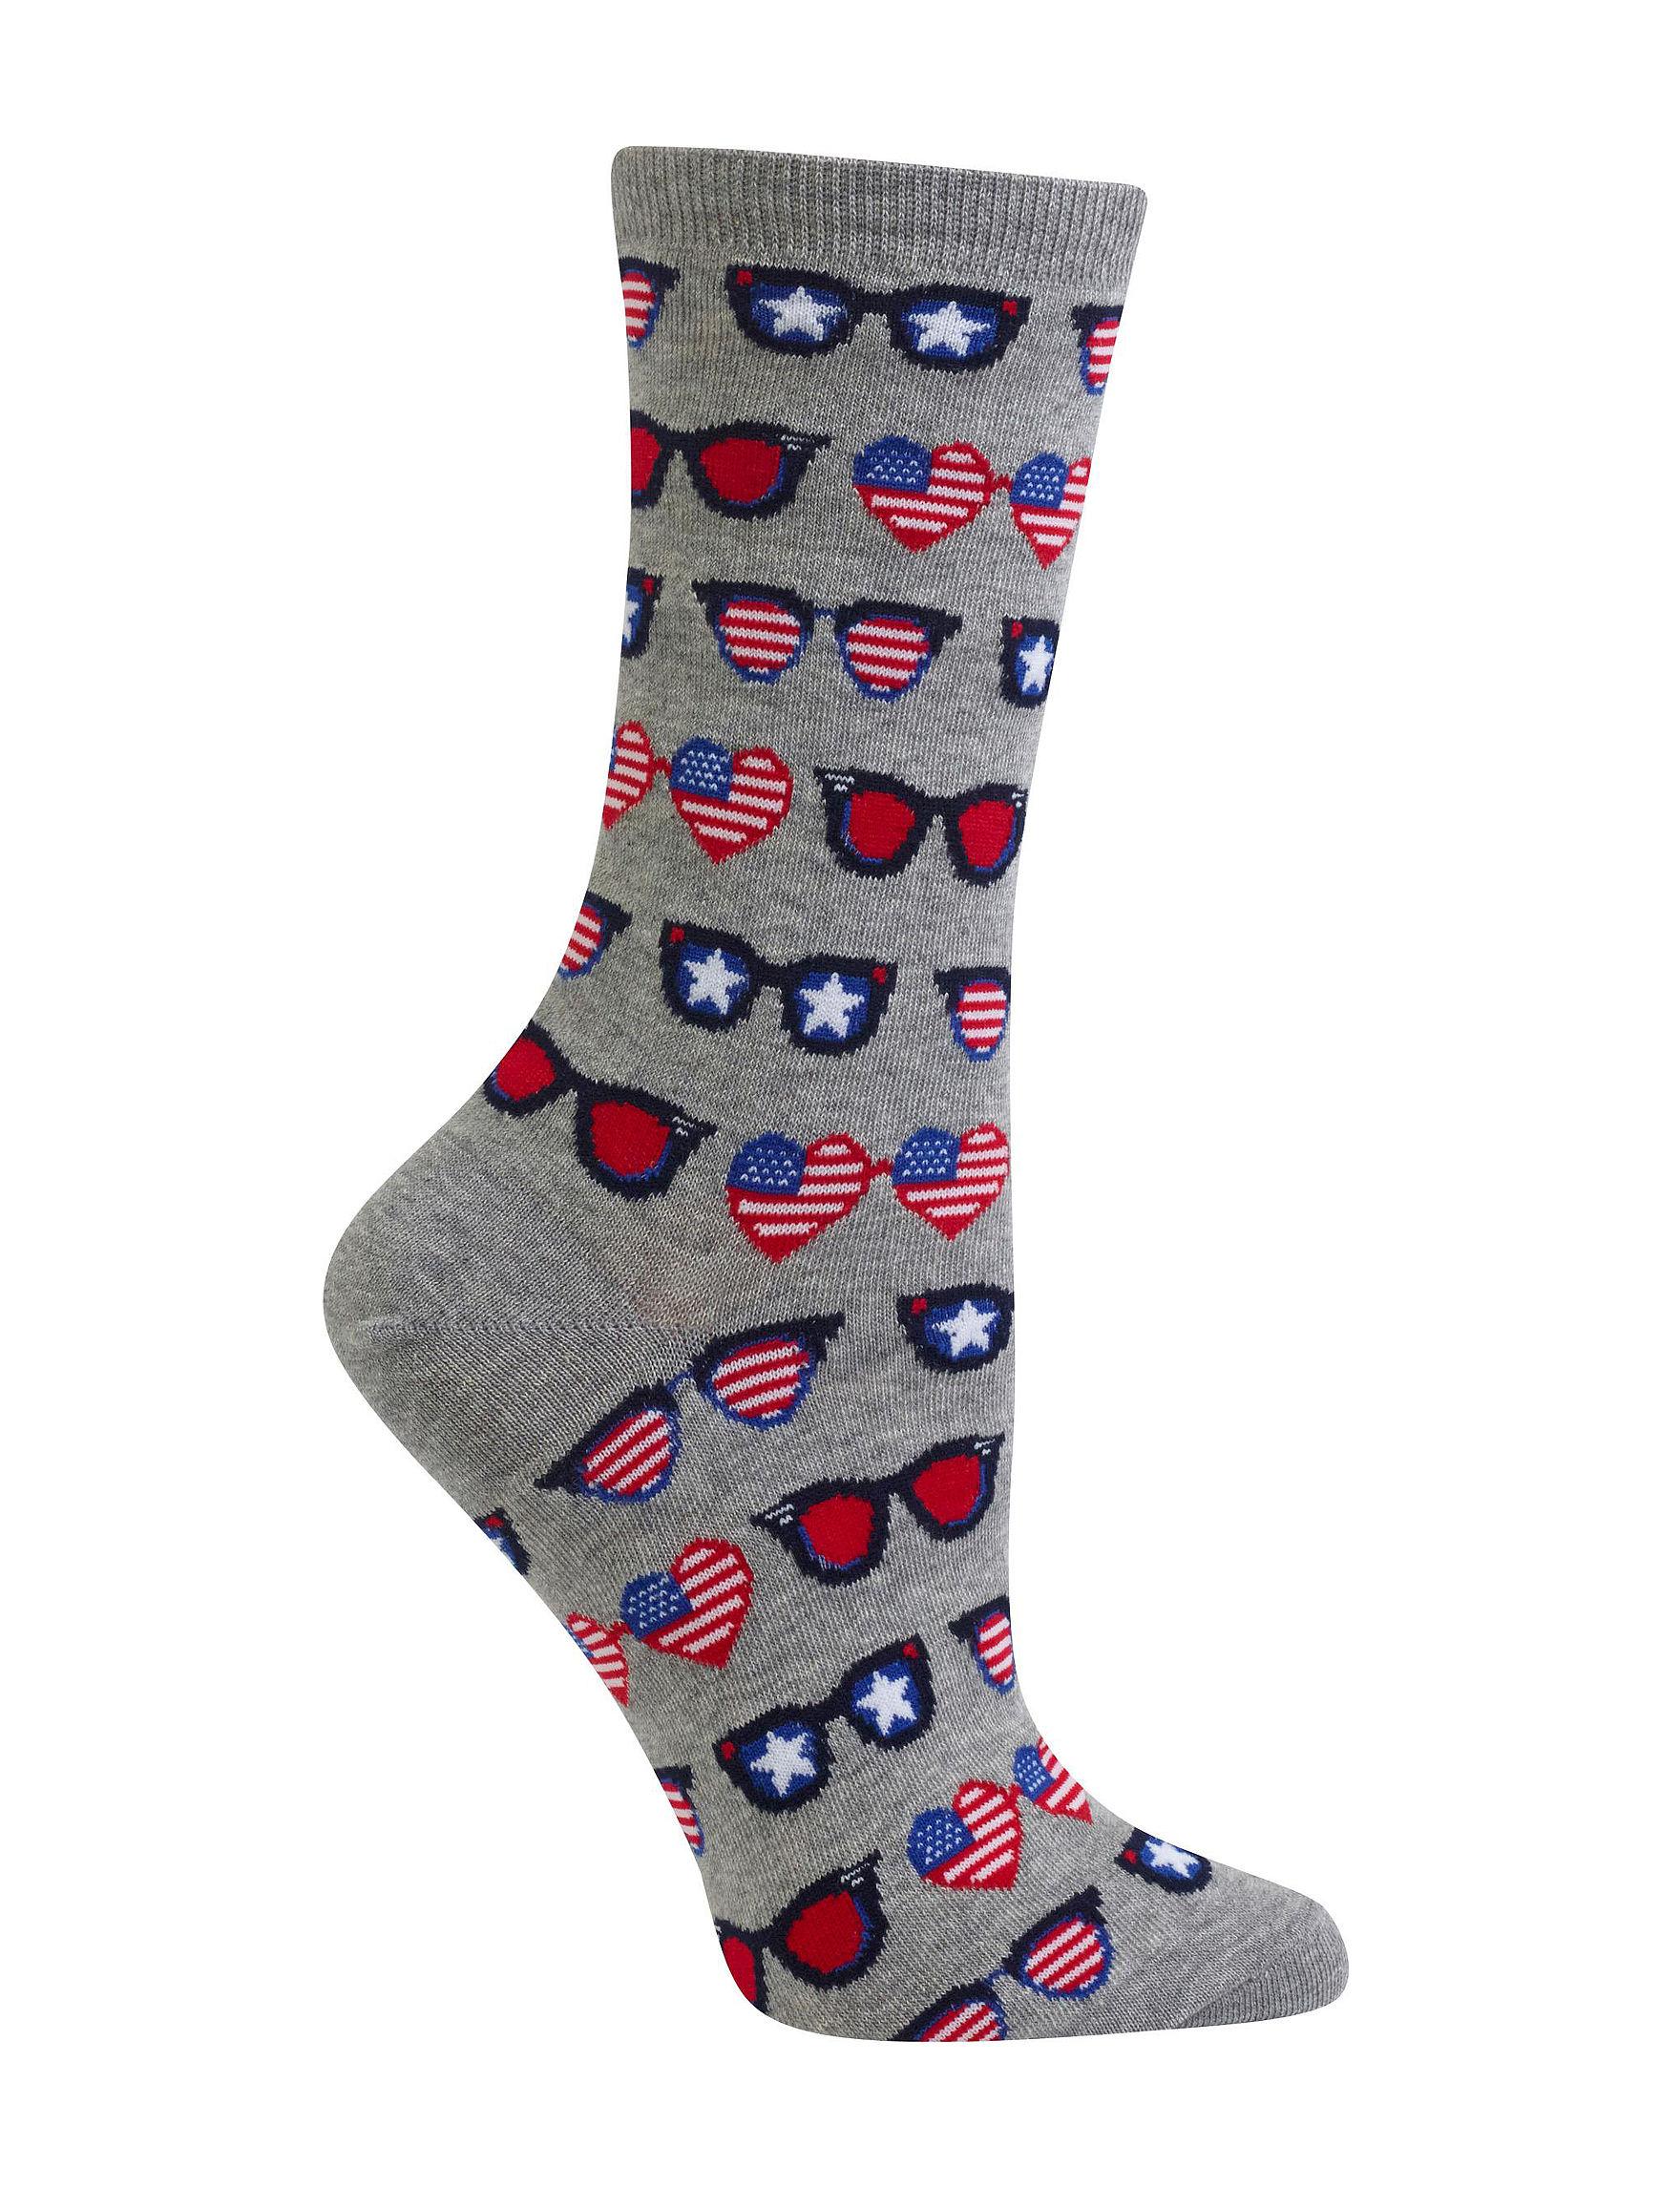 Hot Sox Grey Socks